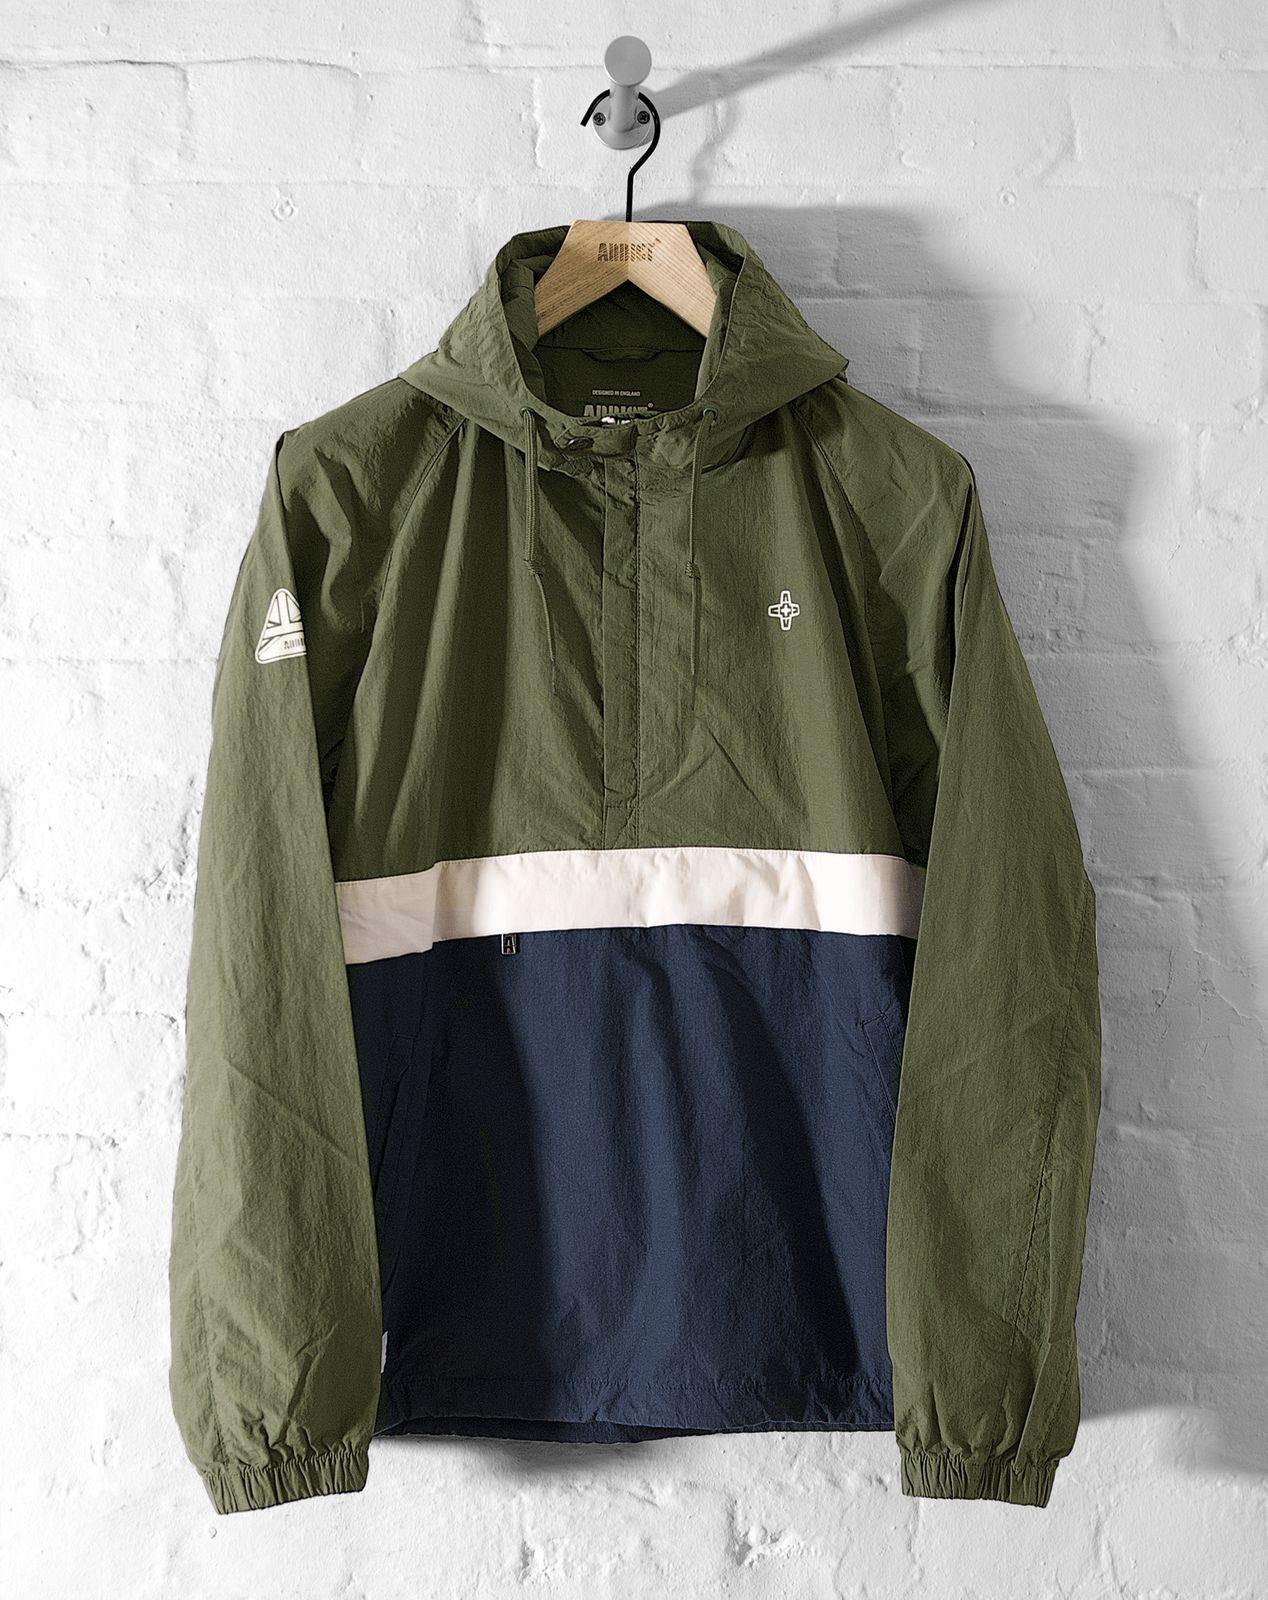 Mens jacket half - Addict Mens Eavis Smock Half Zip Hooded Jacket Cotton Nylon 80 S Style New